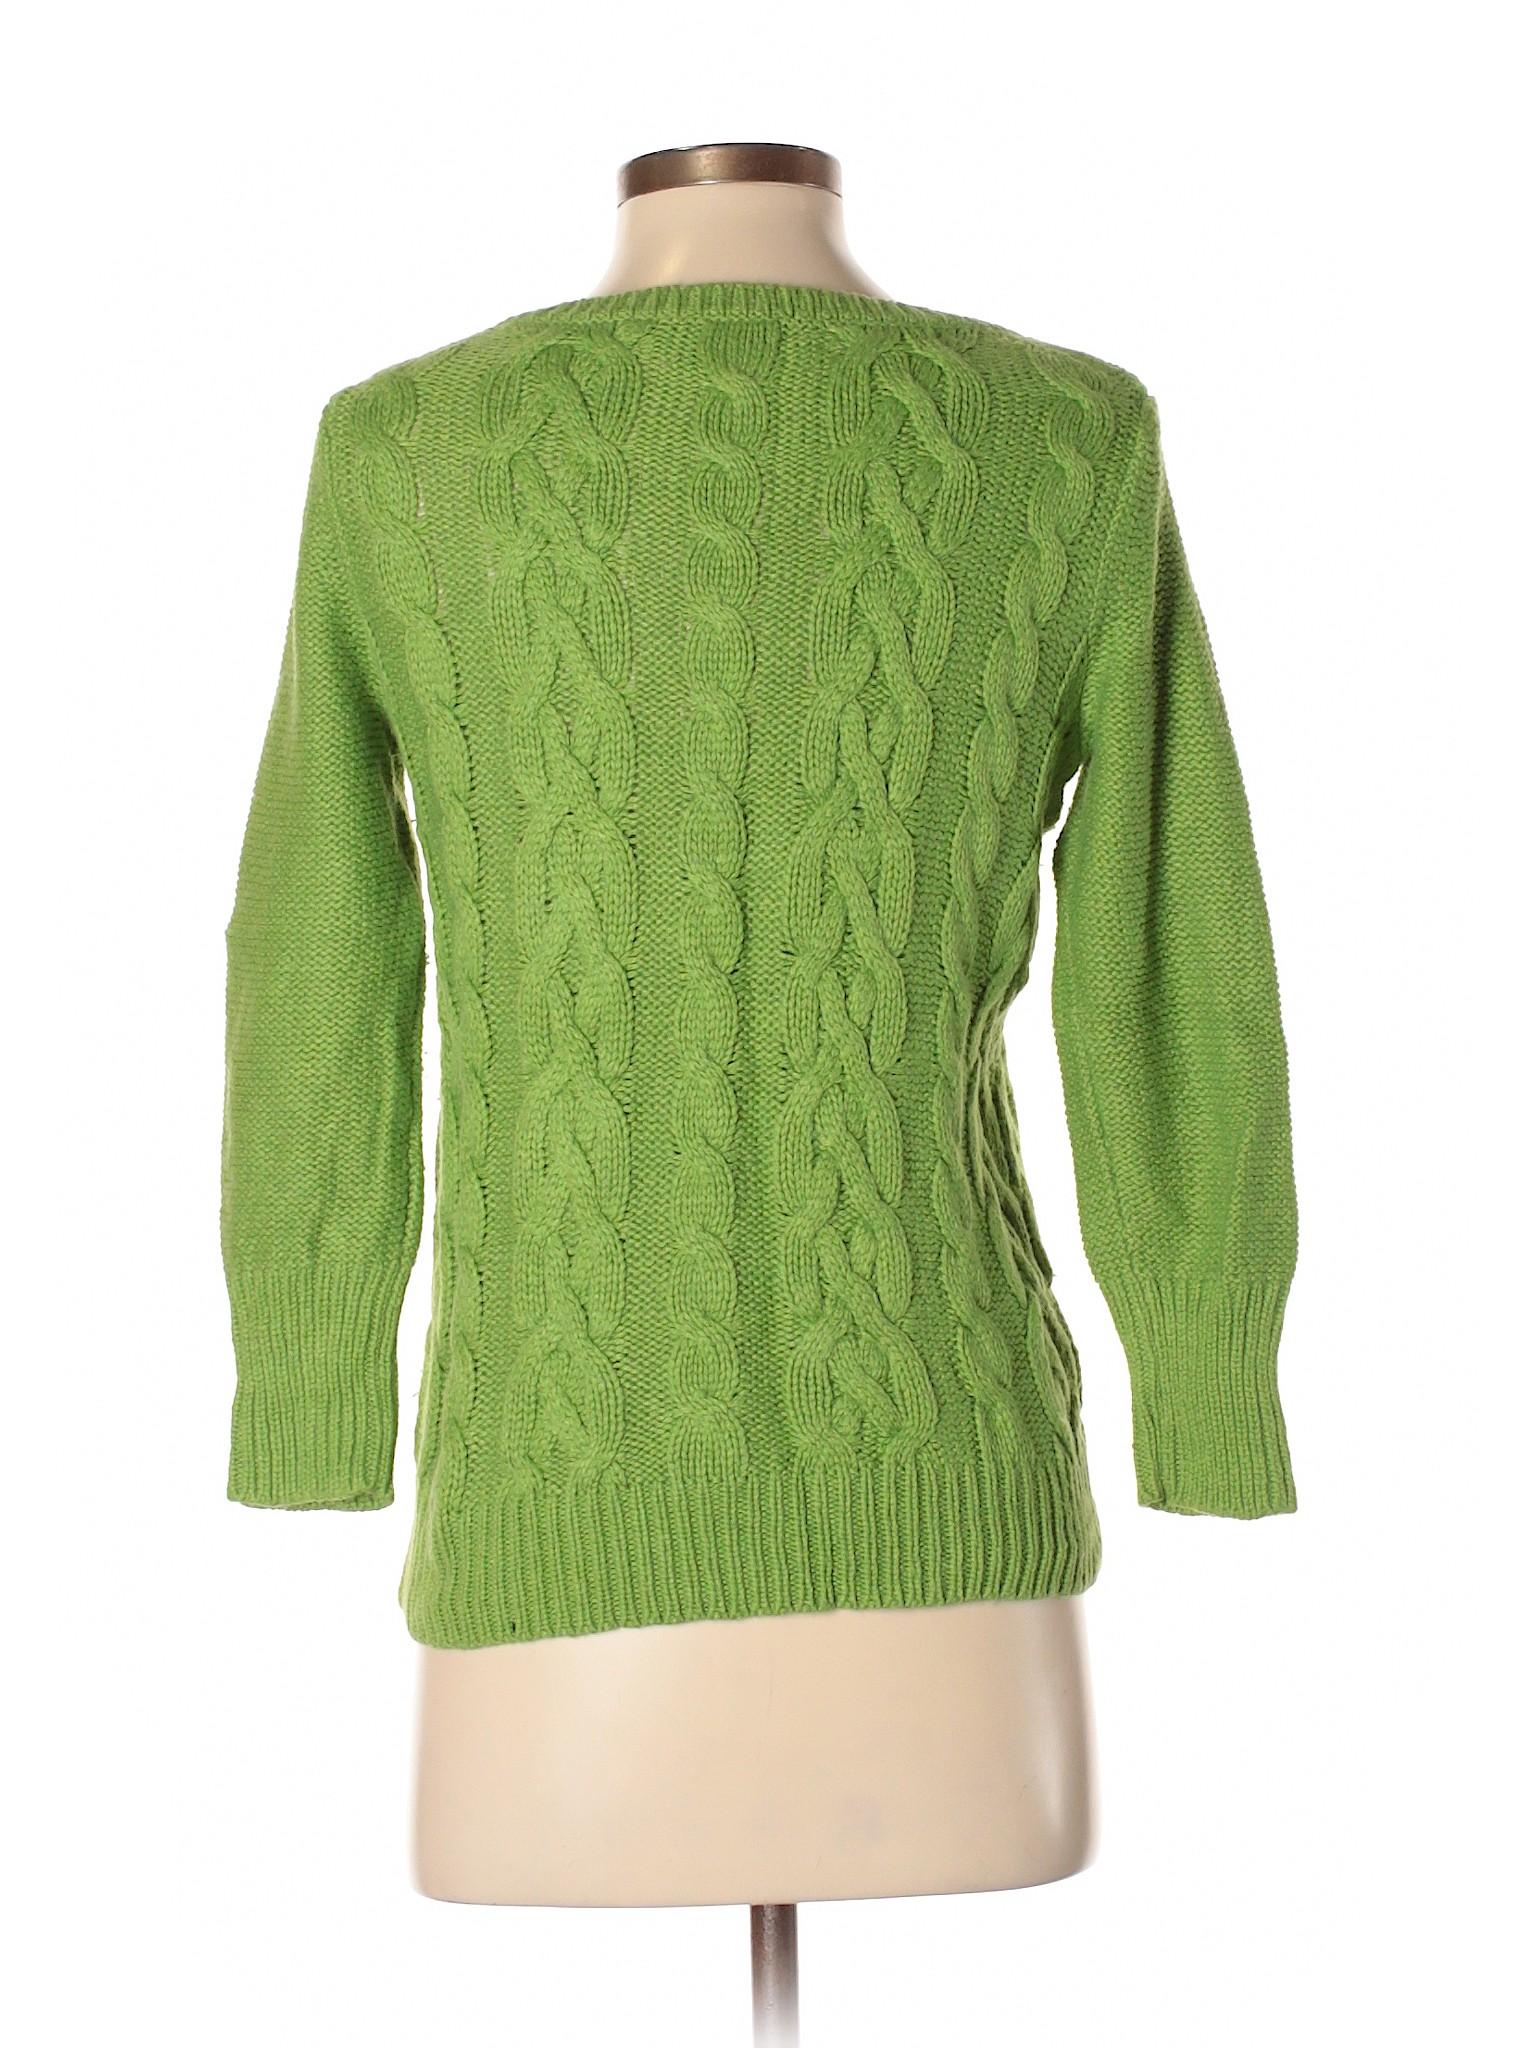 Boutique winter Taylor Sweater Pullover LOFT Ann qHZxrawqU